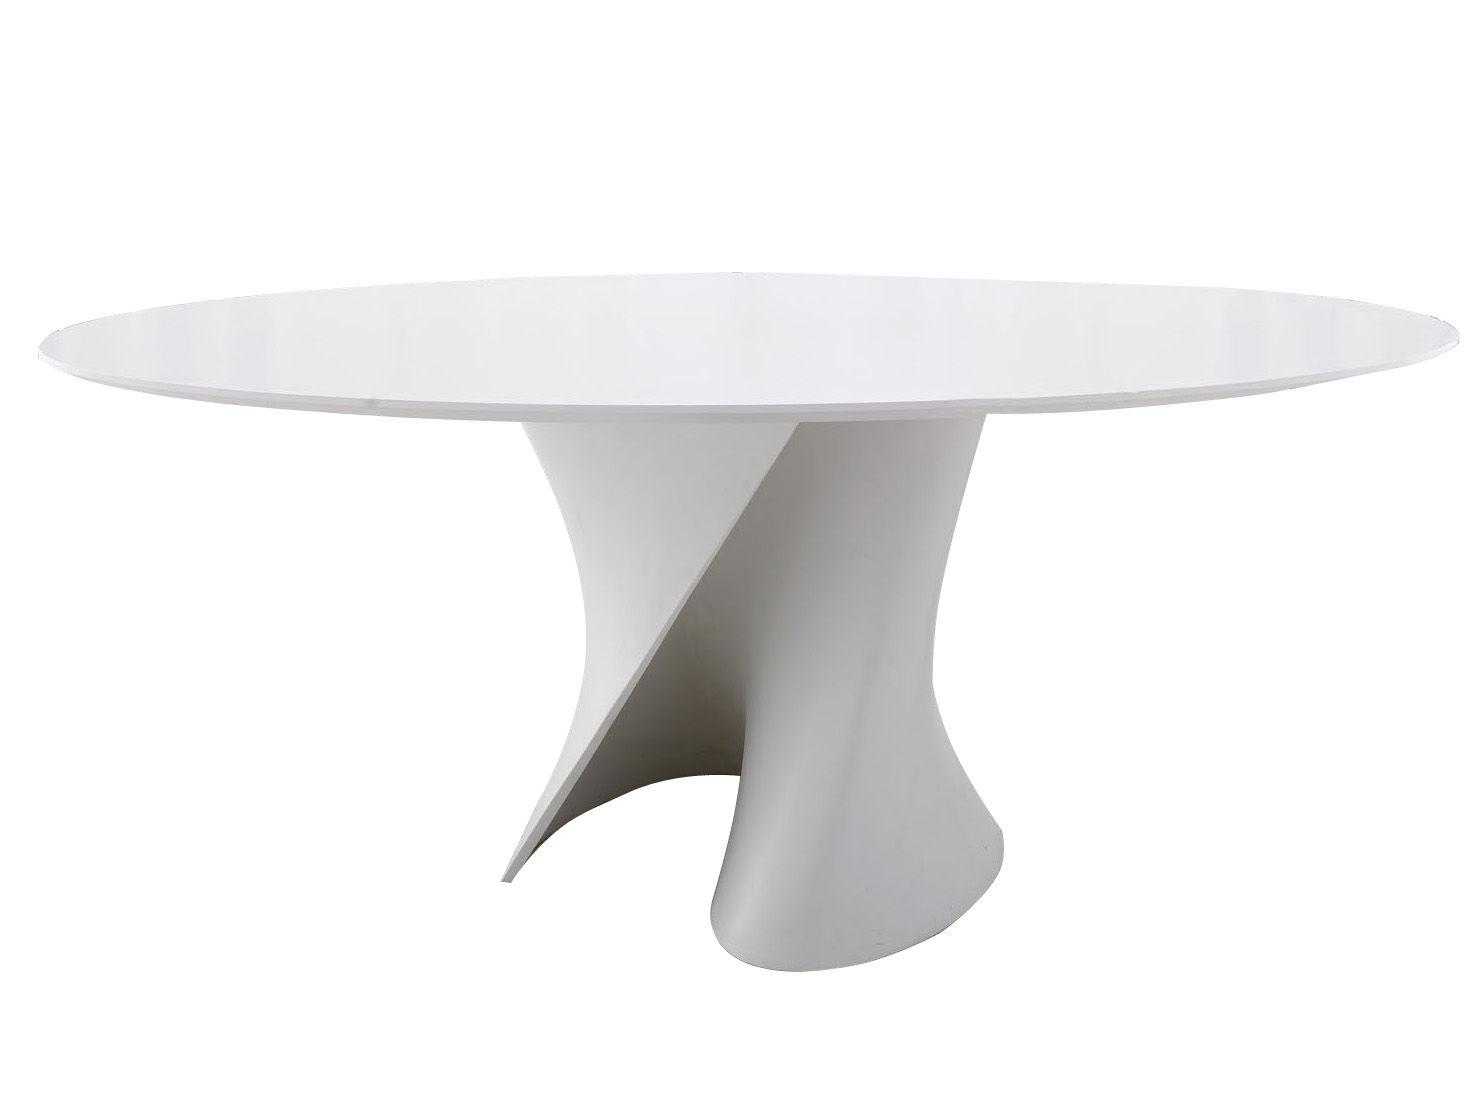 Mobilier - Tables - Table S Ovale /150 x 210 cm - Plateau cristalplant - MDF Italia - Blanc - Cristalplant